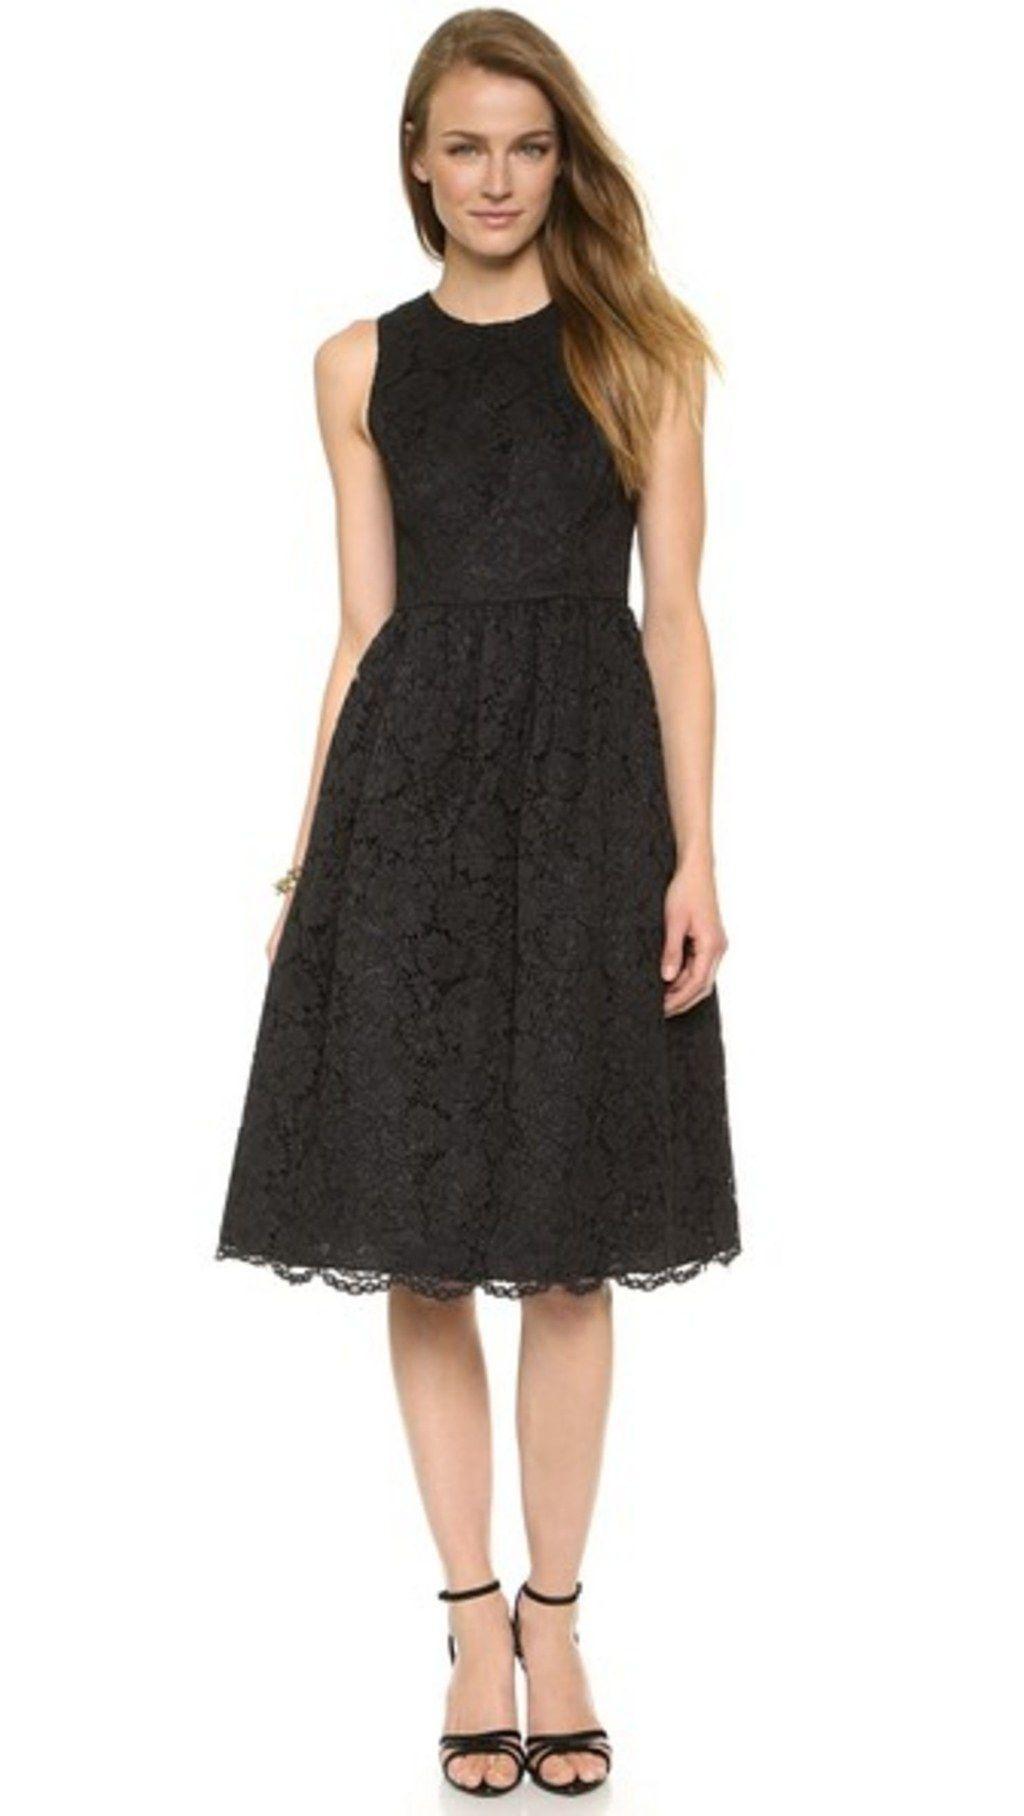 Fashion week Dresses black for wedding for girls